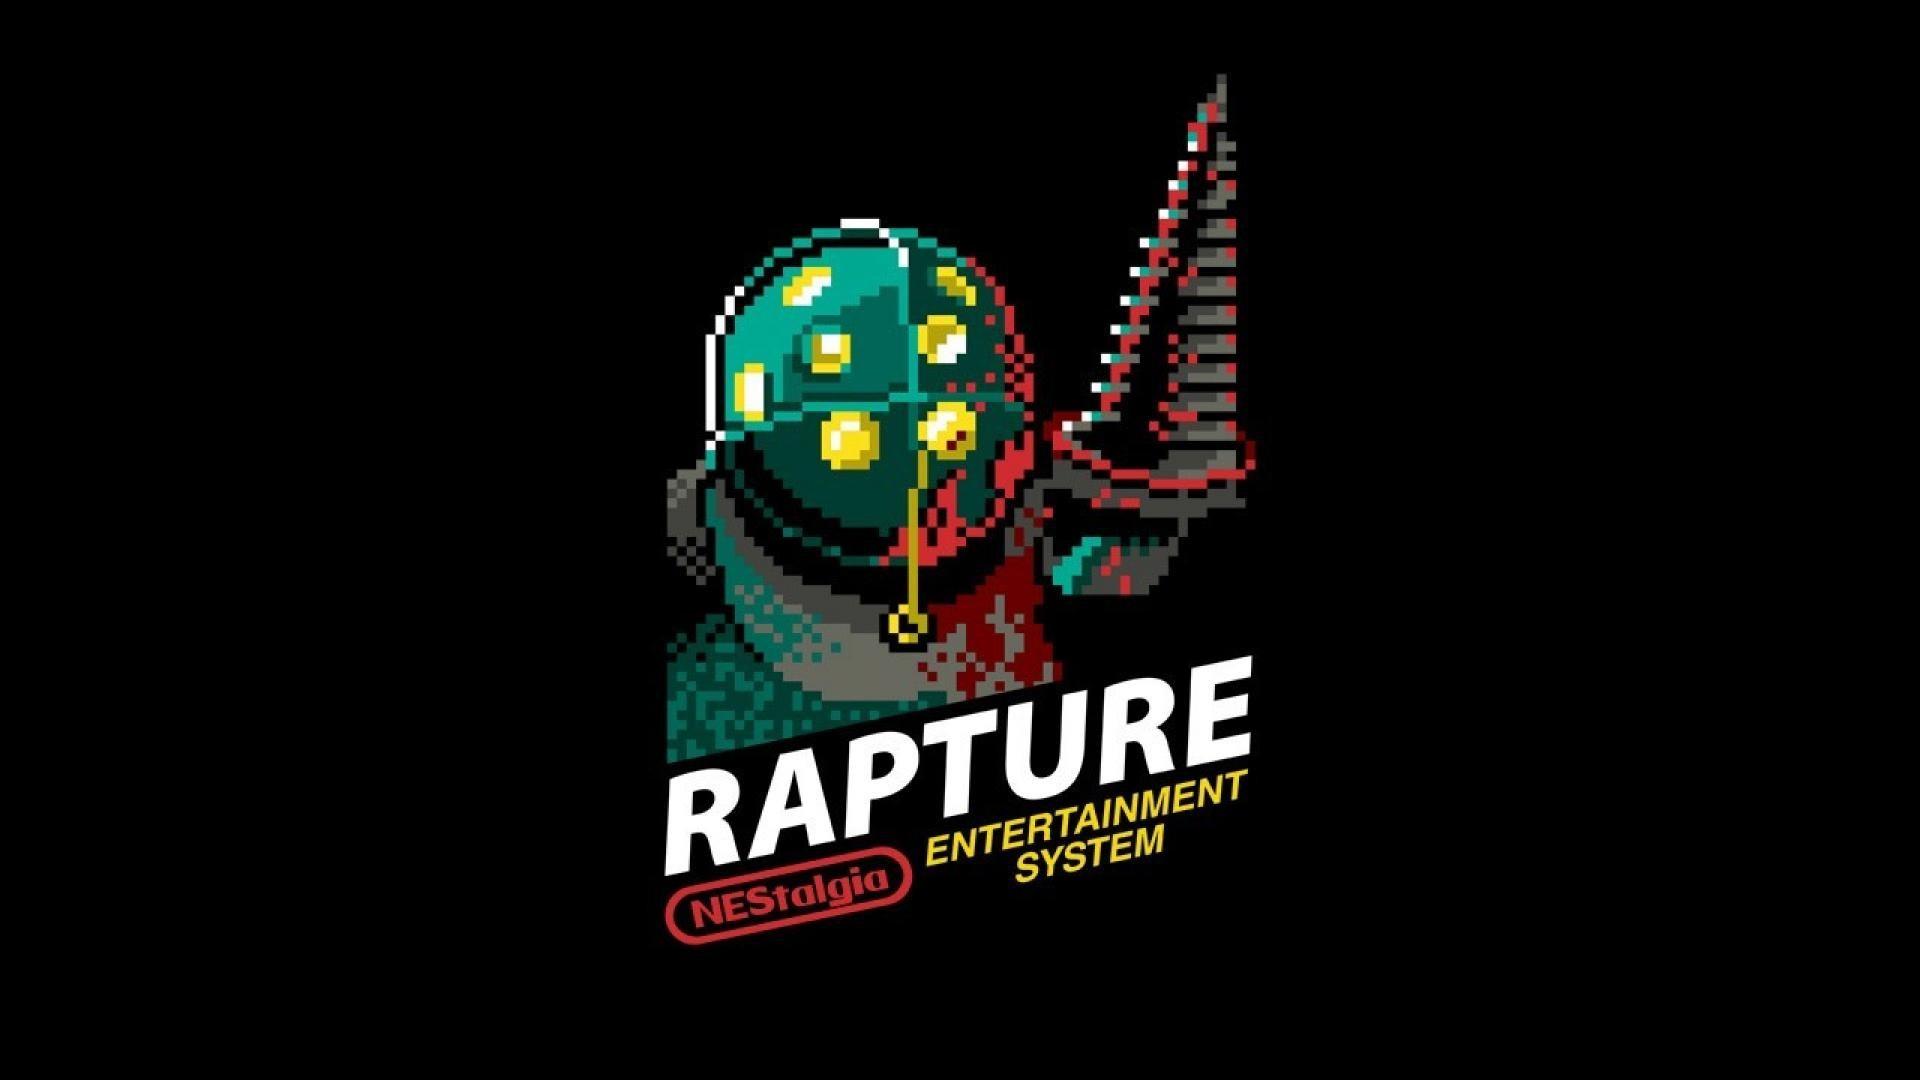 Res: 1920x1080, Bioshock rapture retro games nes 8 bit game wallpaper 39650